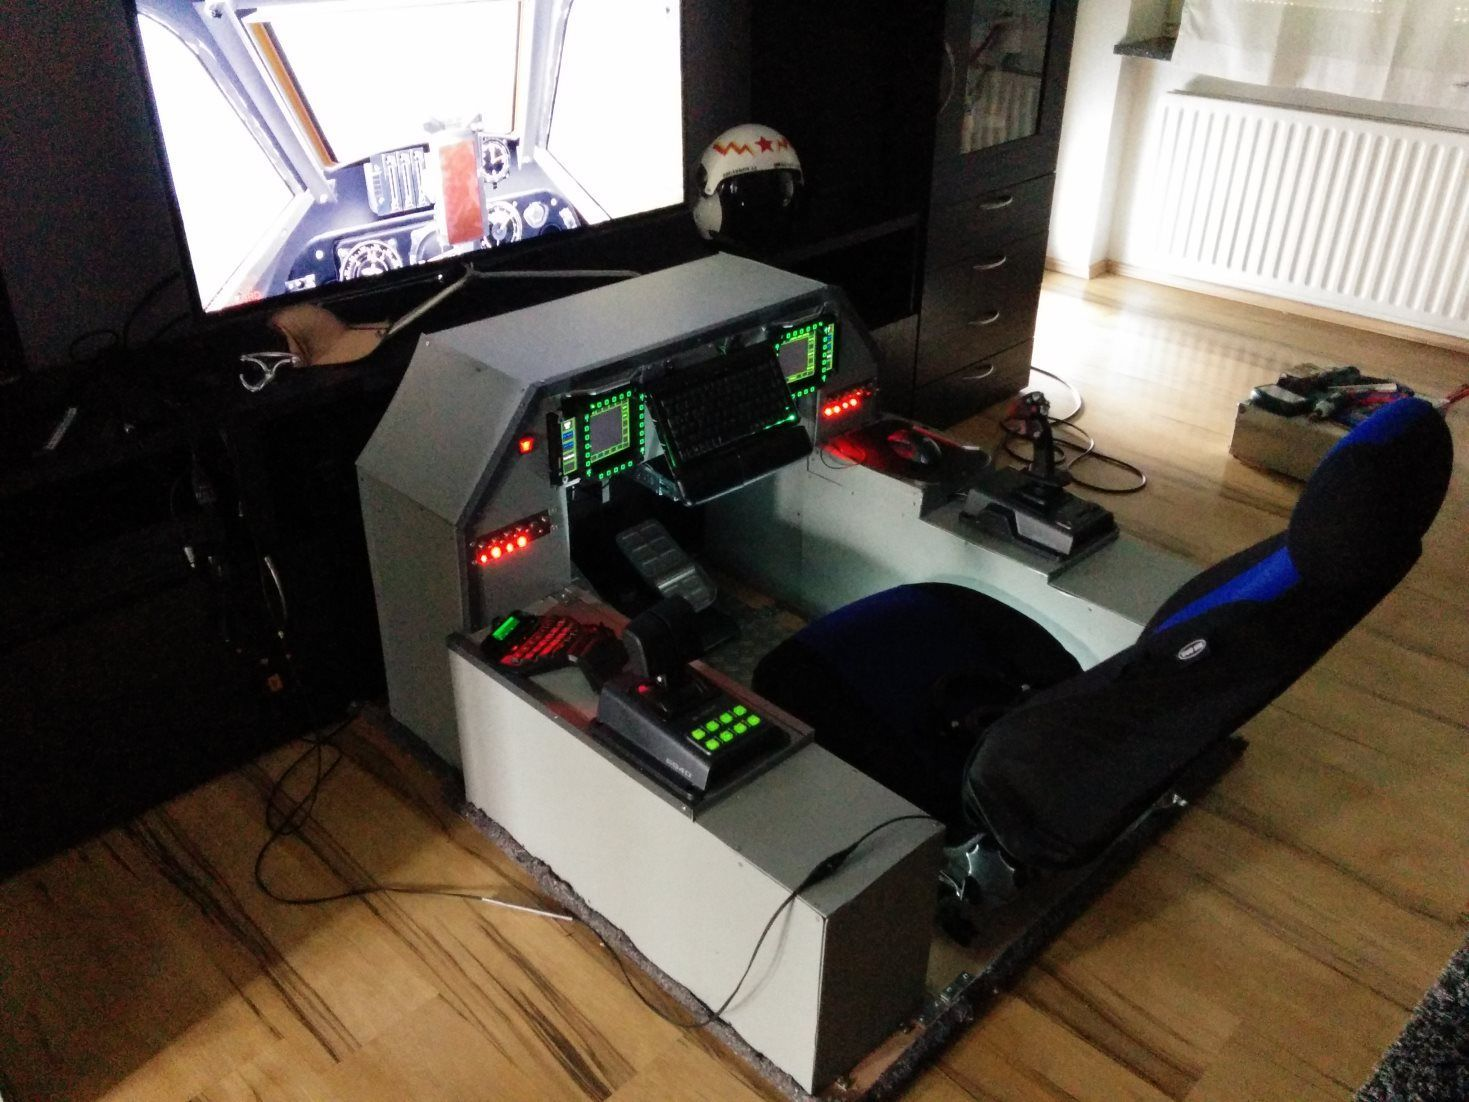 Free Image Hosting Flight simulator, Flight simulator